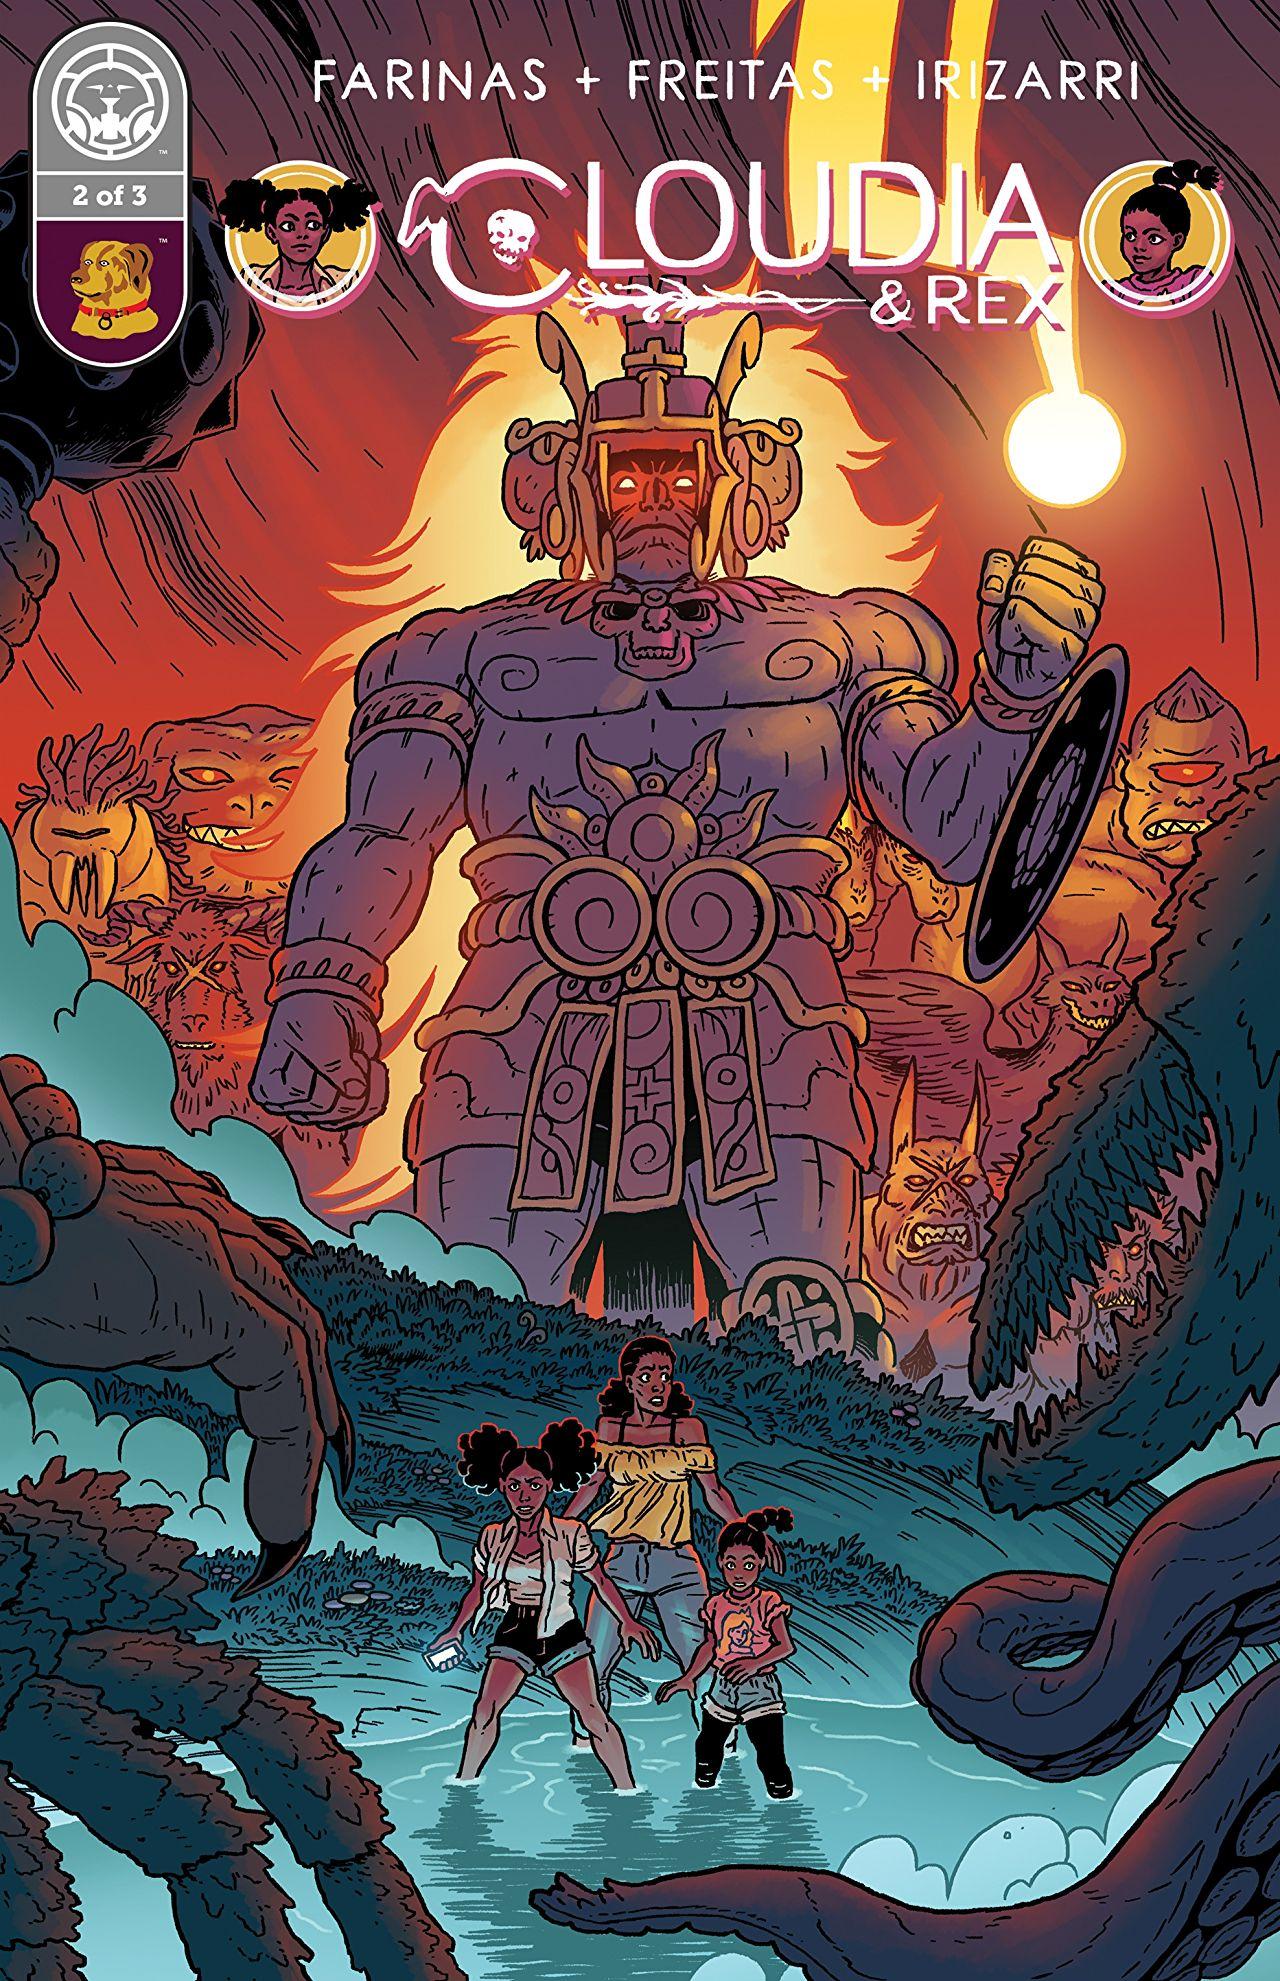 Cloudia & Rex #2 Review